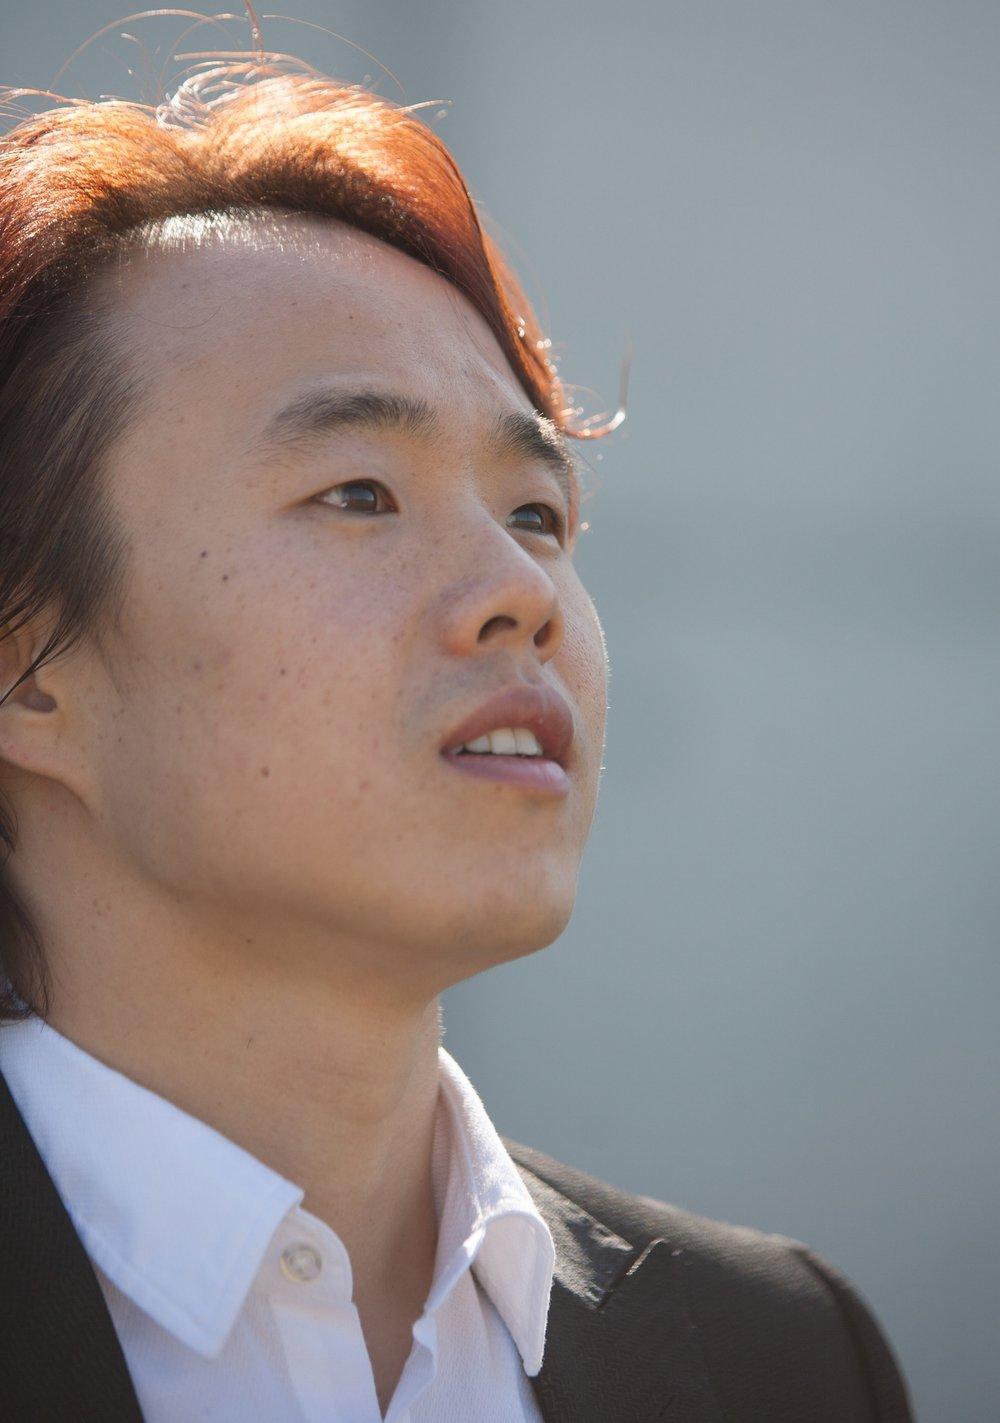 Alfredo: Won Whi Choi